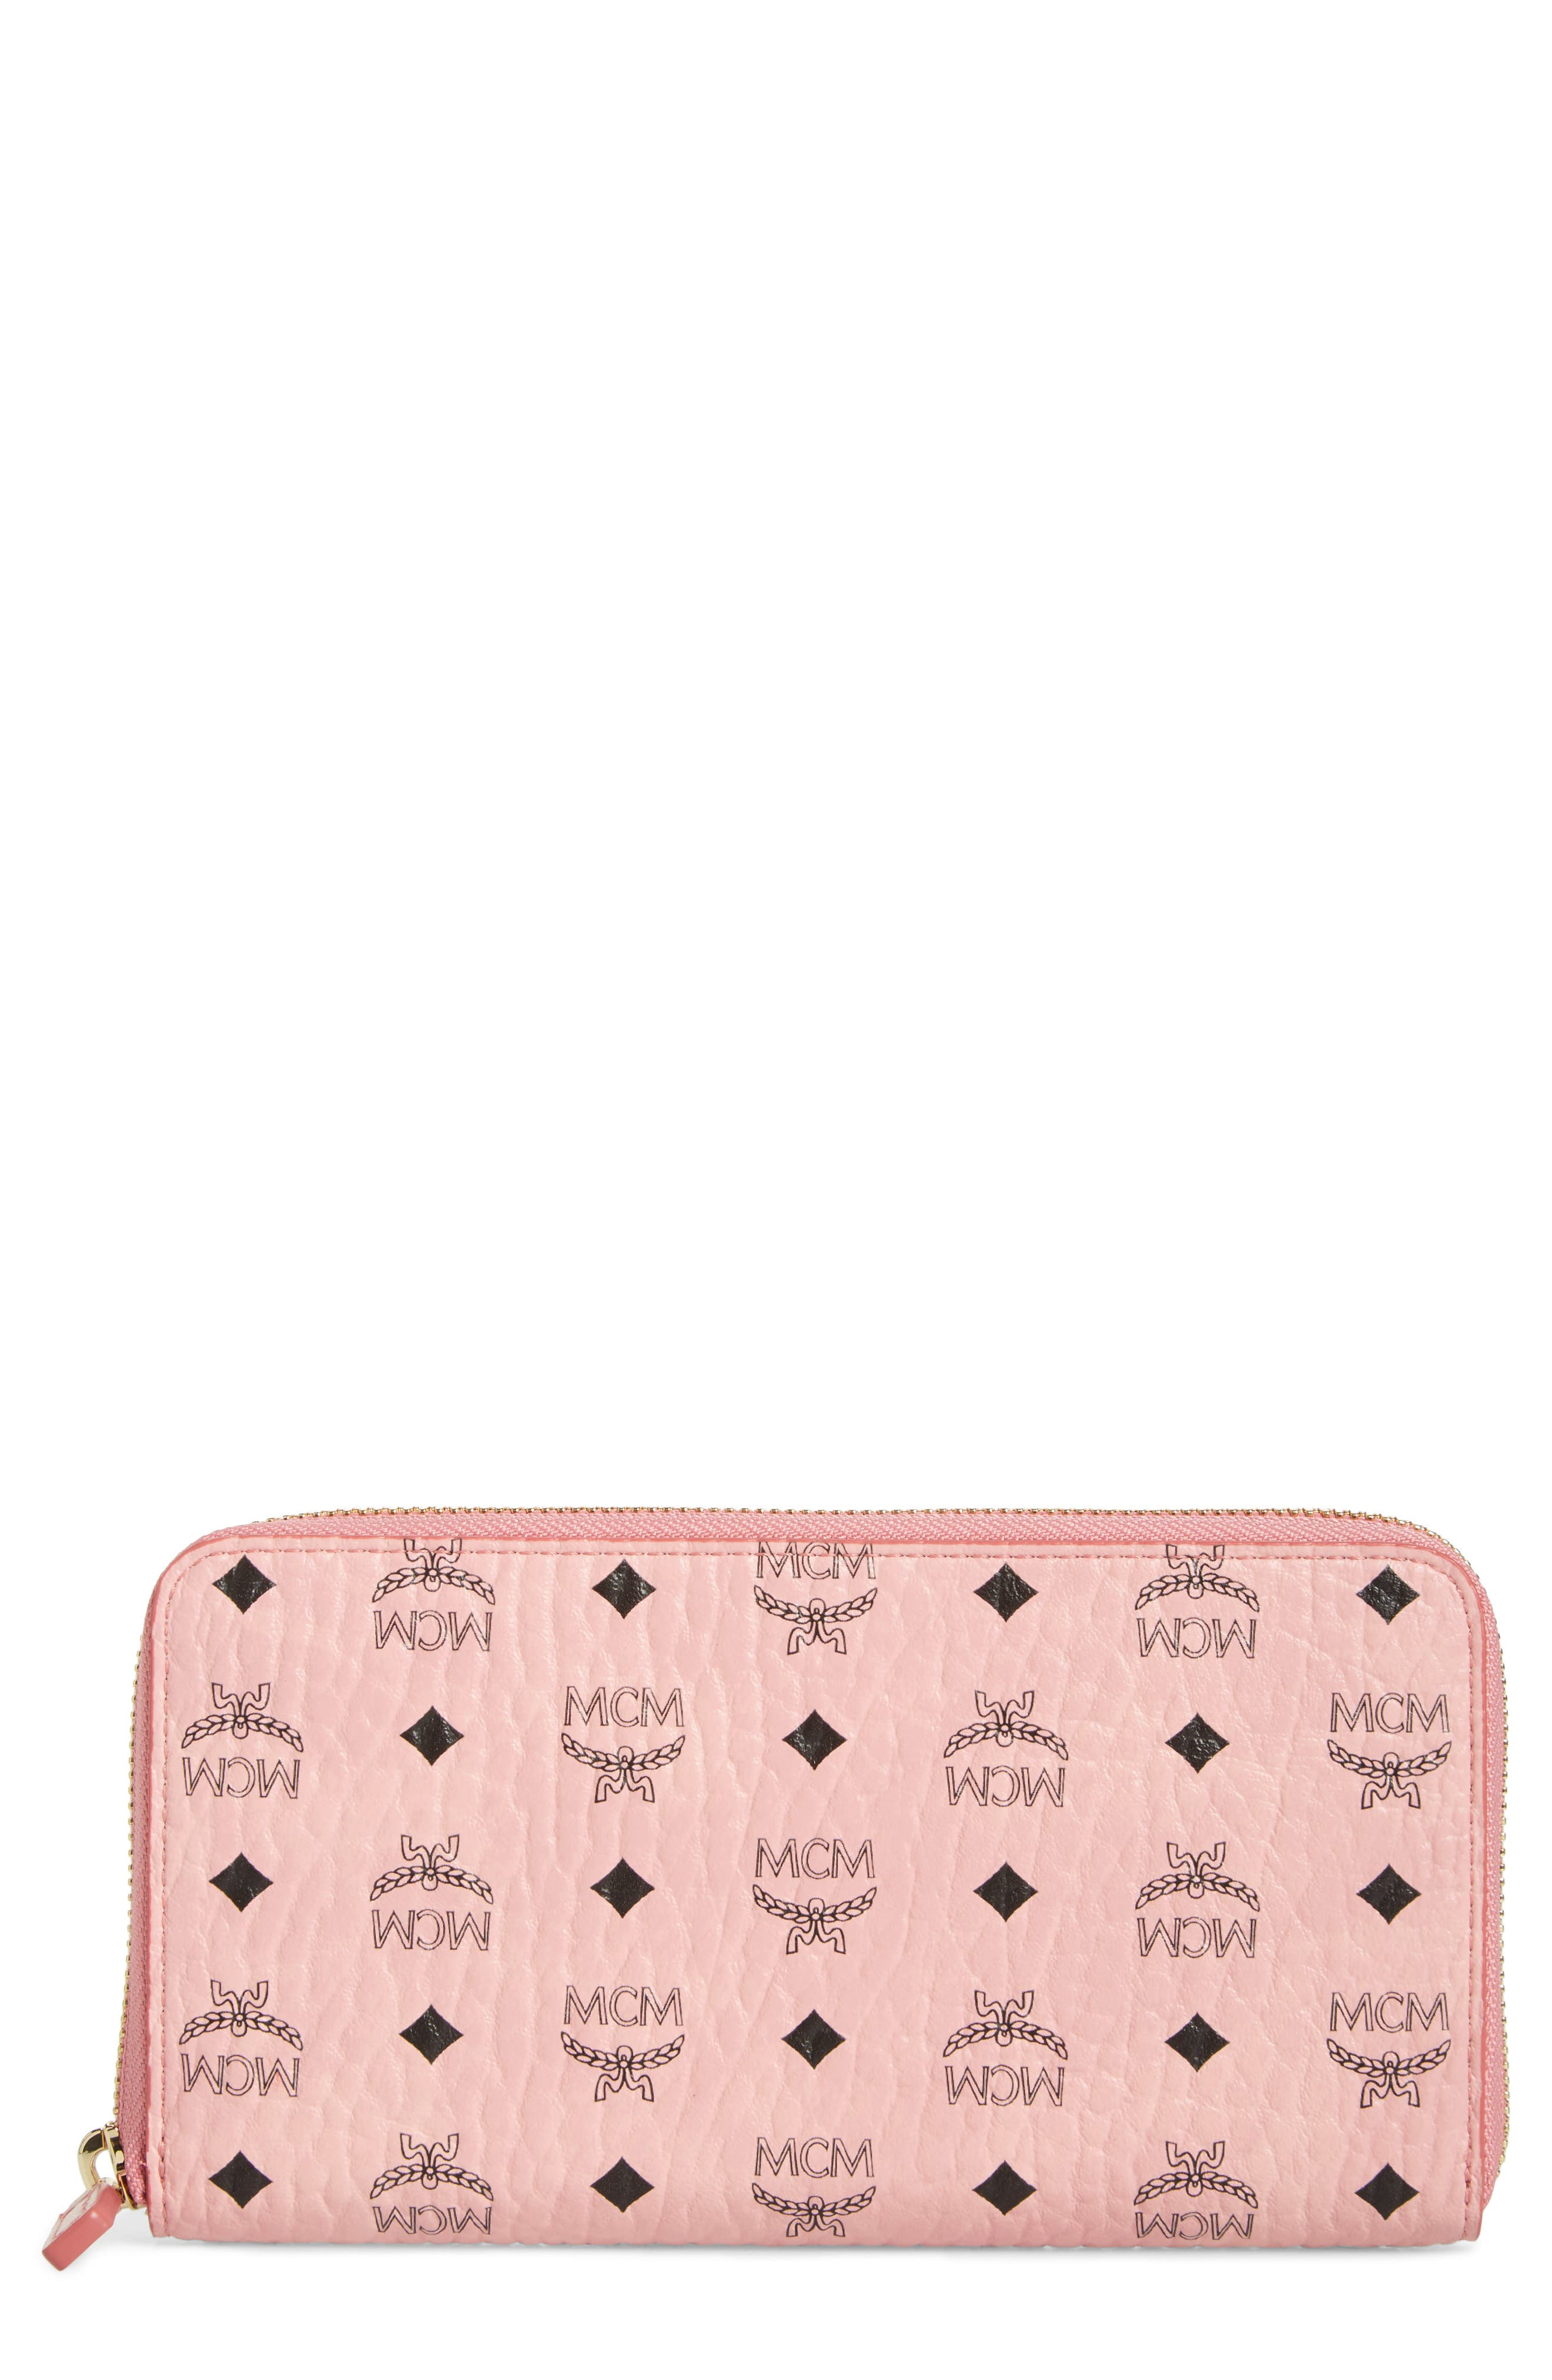 Visetos Coated Canvas Zip Wallet,                         Main,                         color, SOFT PINK